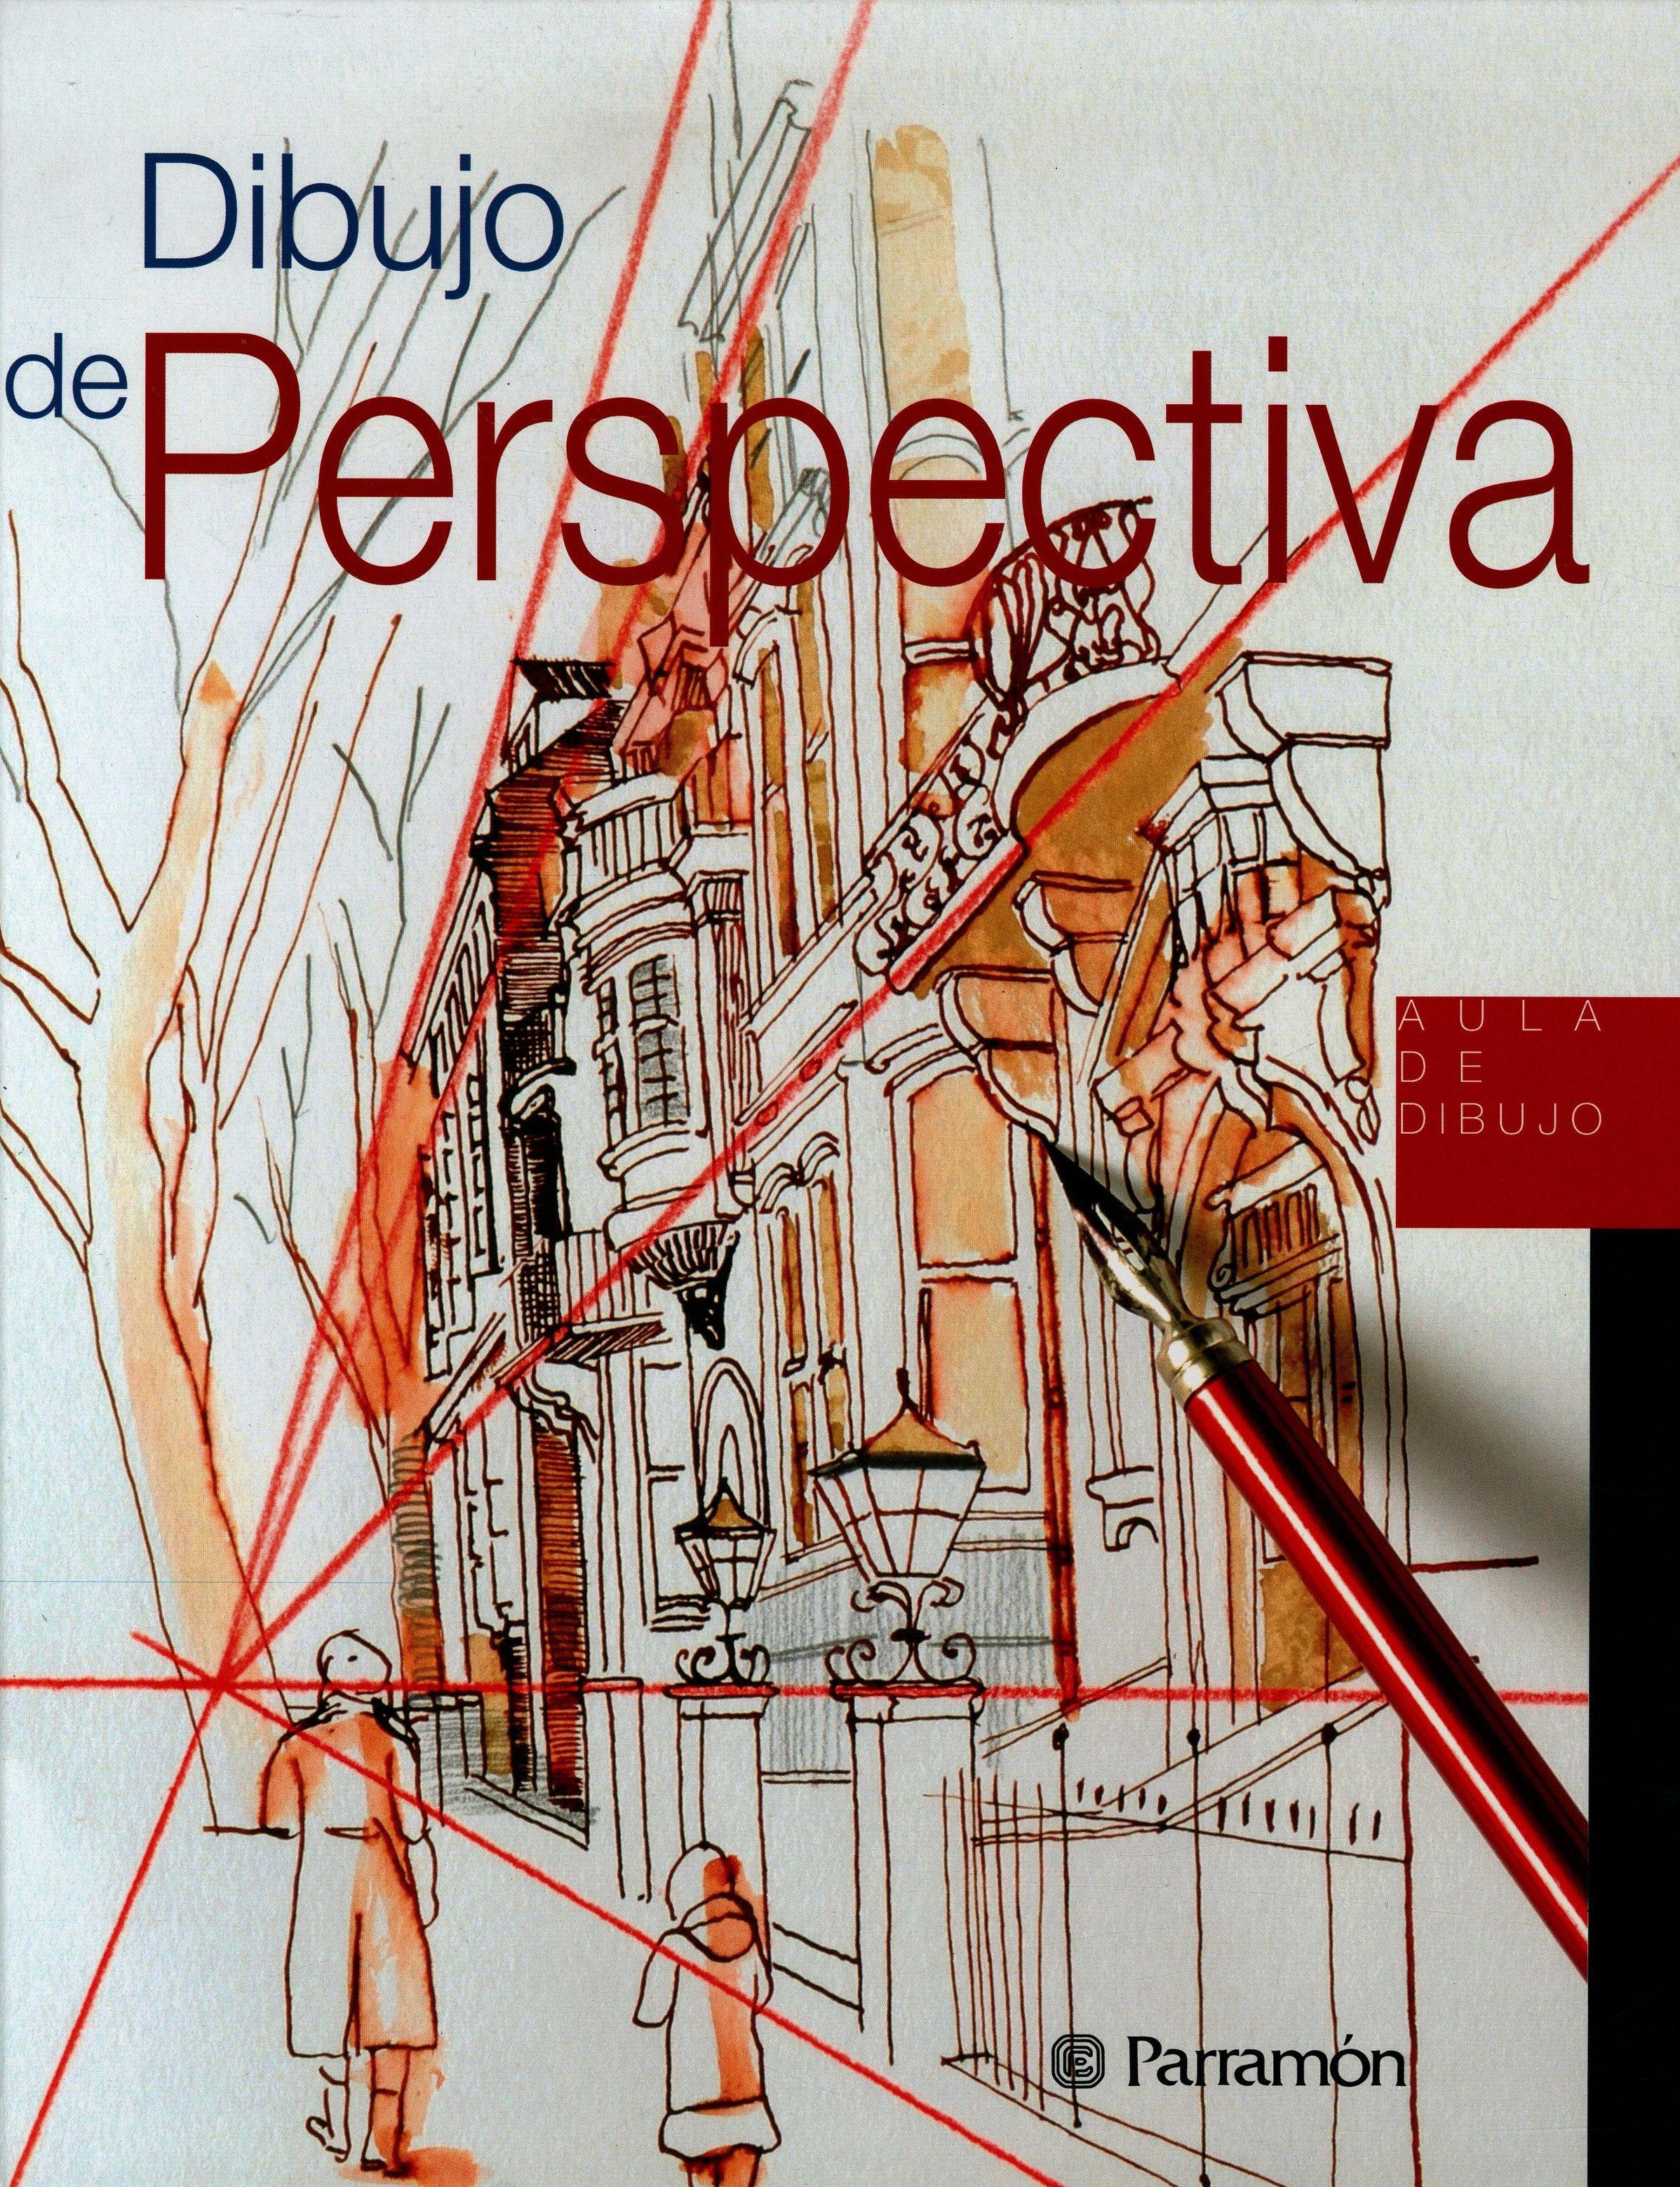 Pin De Karla Goya En Wishlist Dibujo Perspectiva Libros De Dibujo Pdf Perspectiva